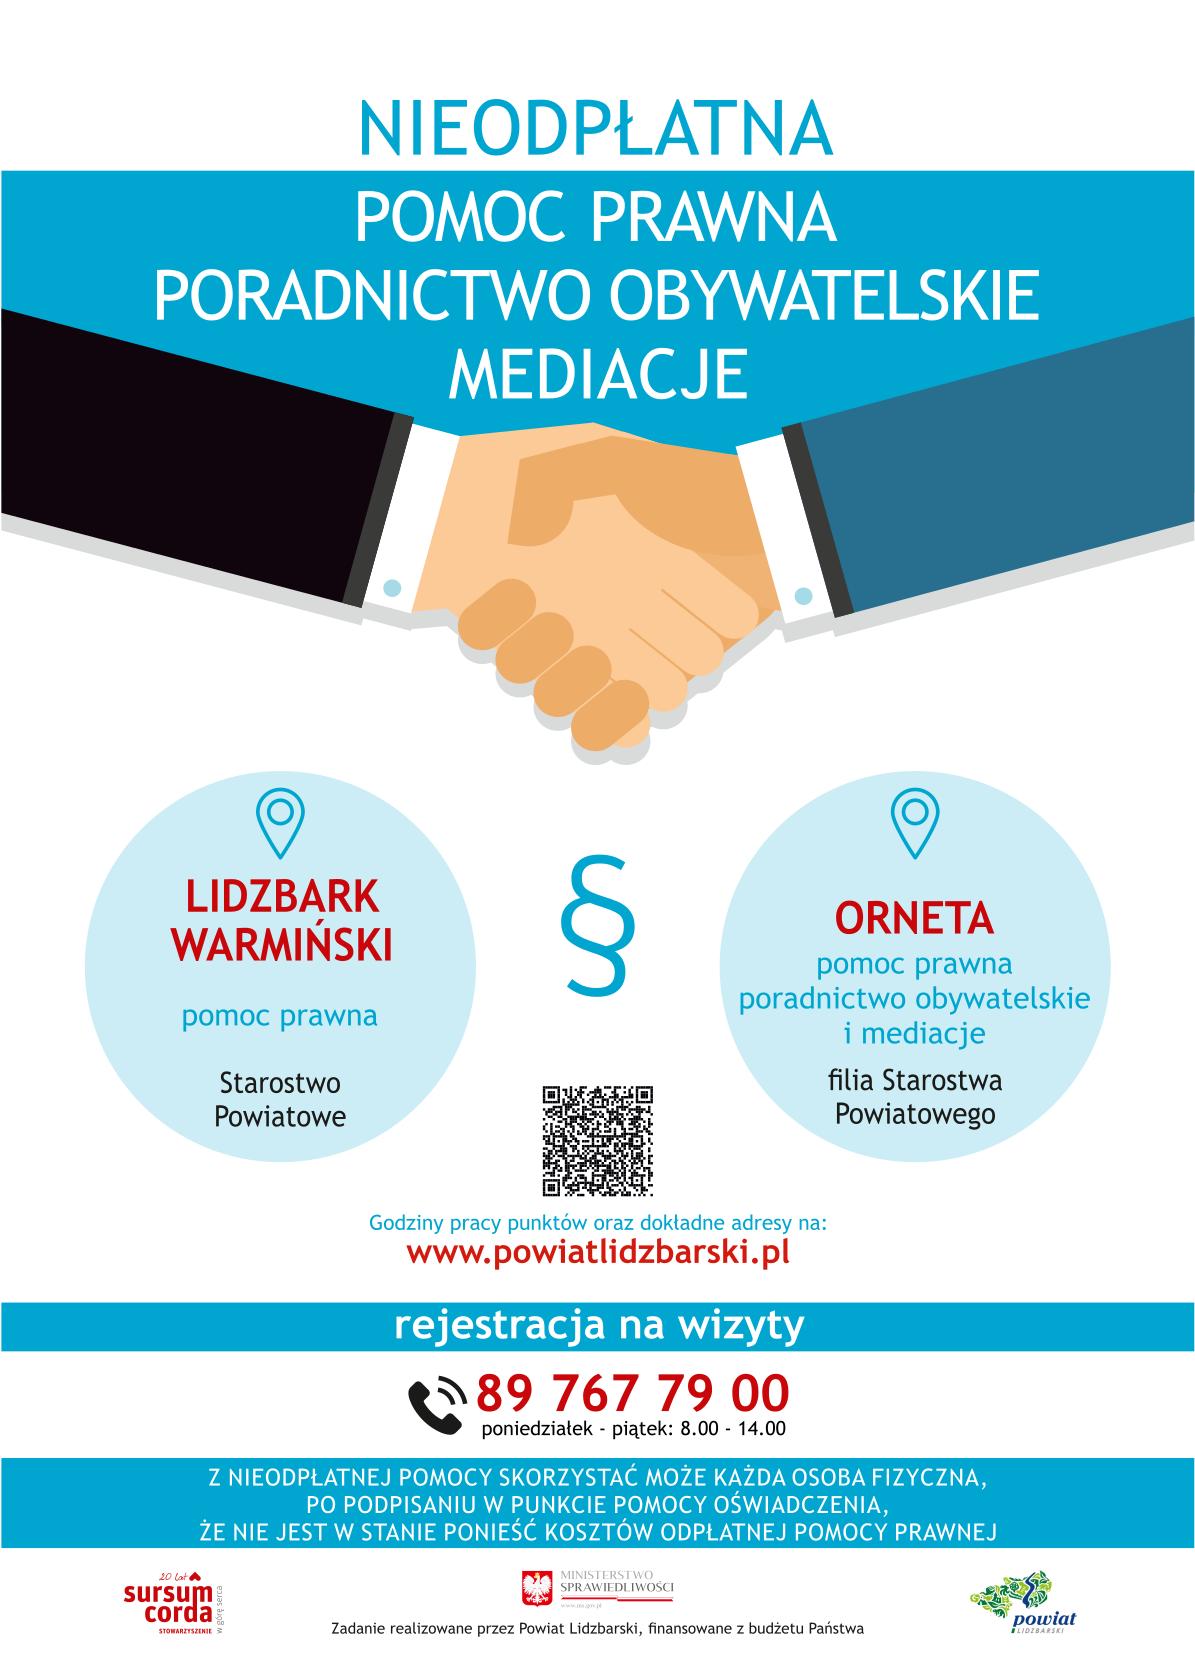 NPP_plakat_2020_pow_lidzbarsk